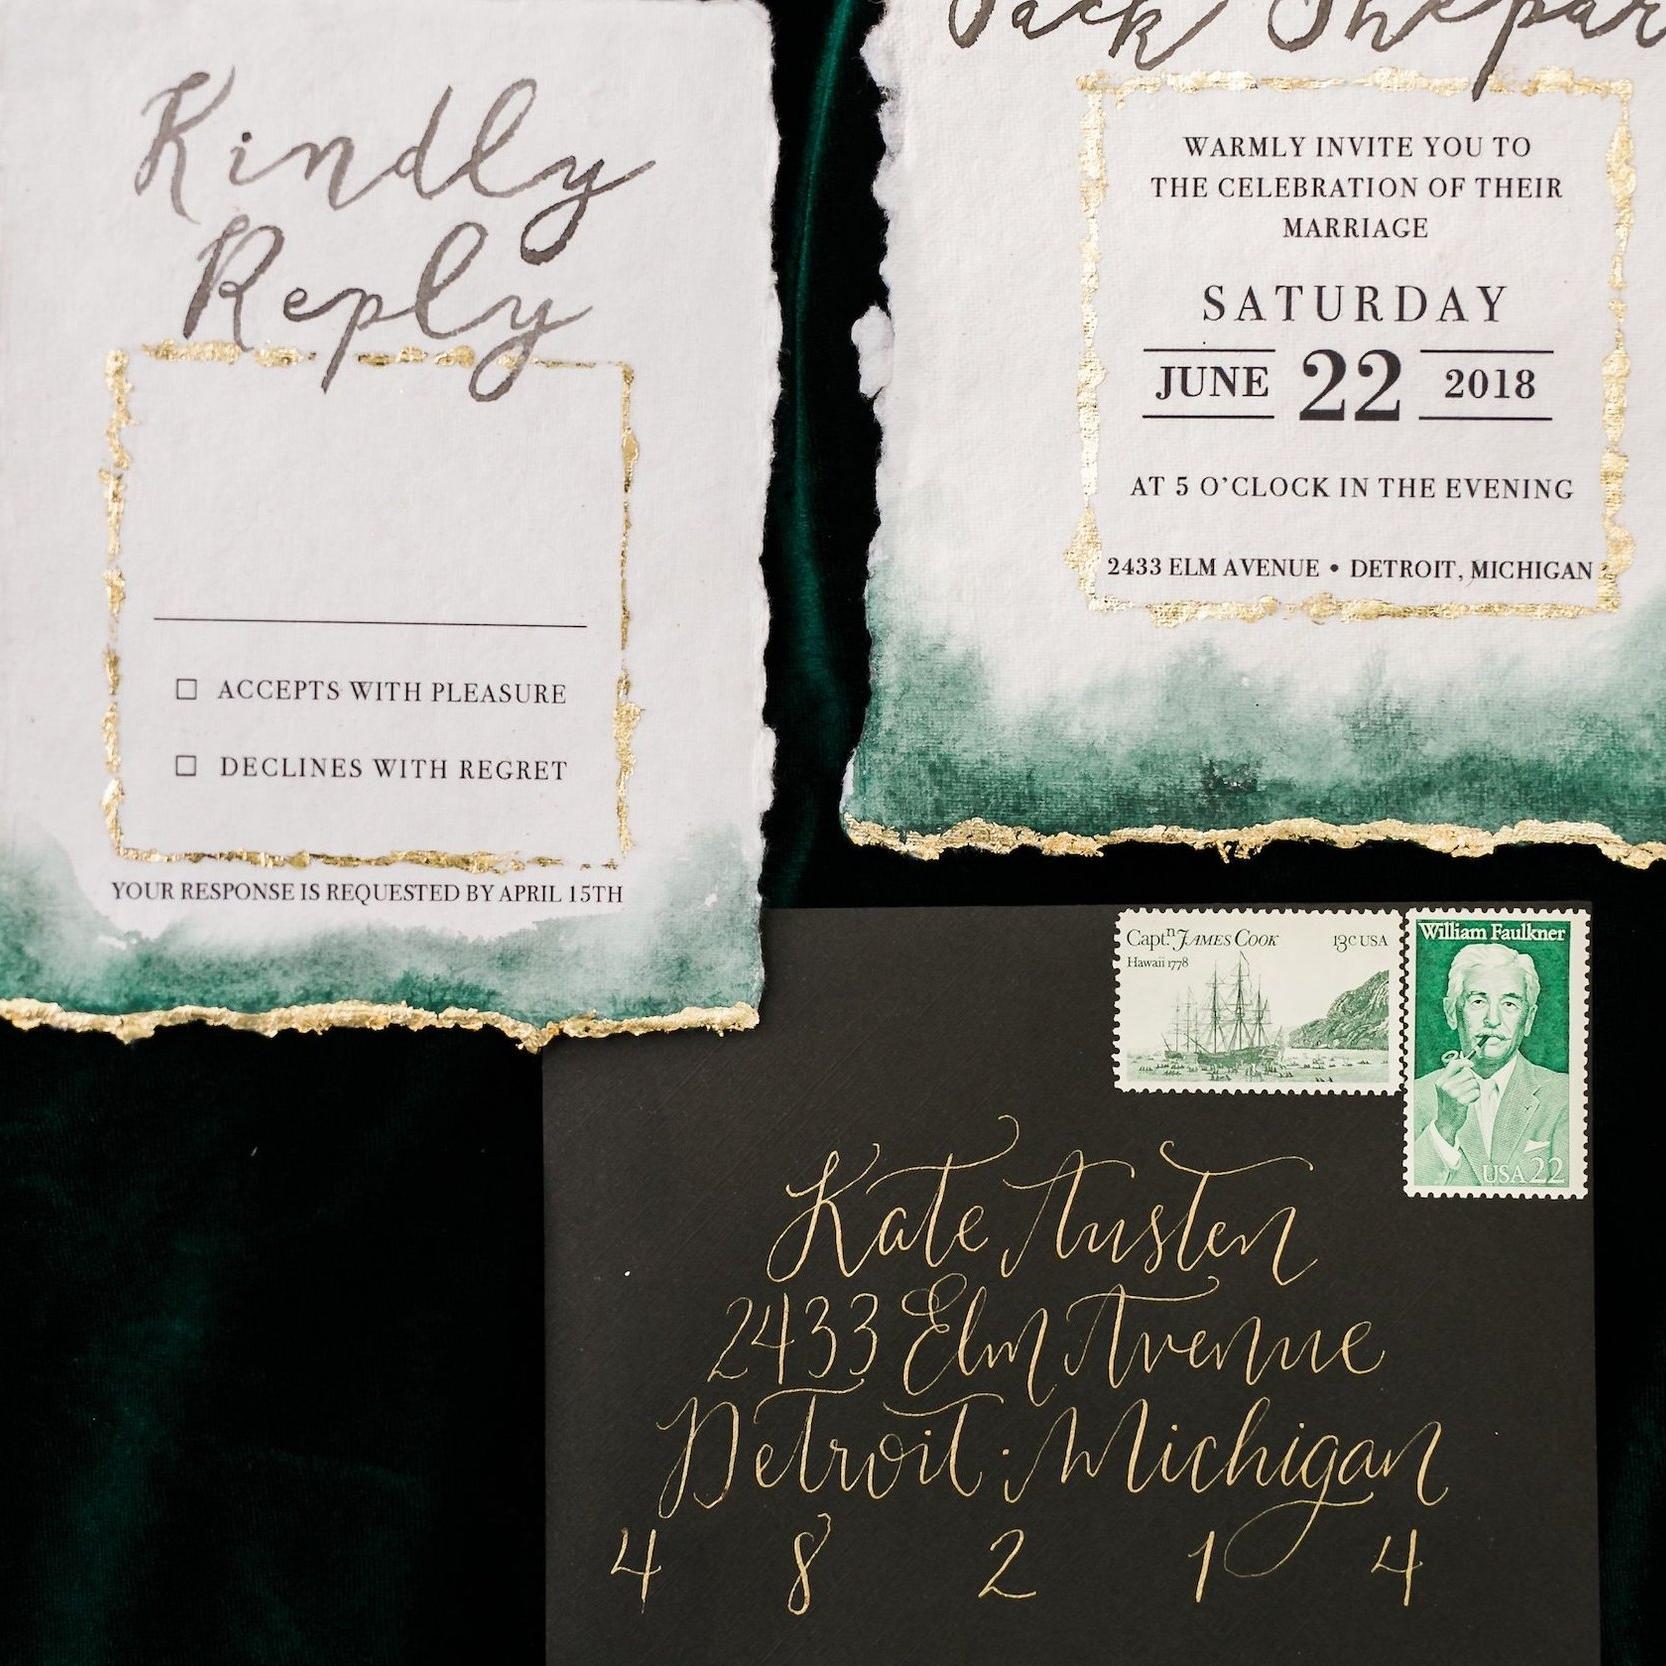 invitation-design-2_annabelreese-web.jpg